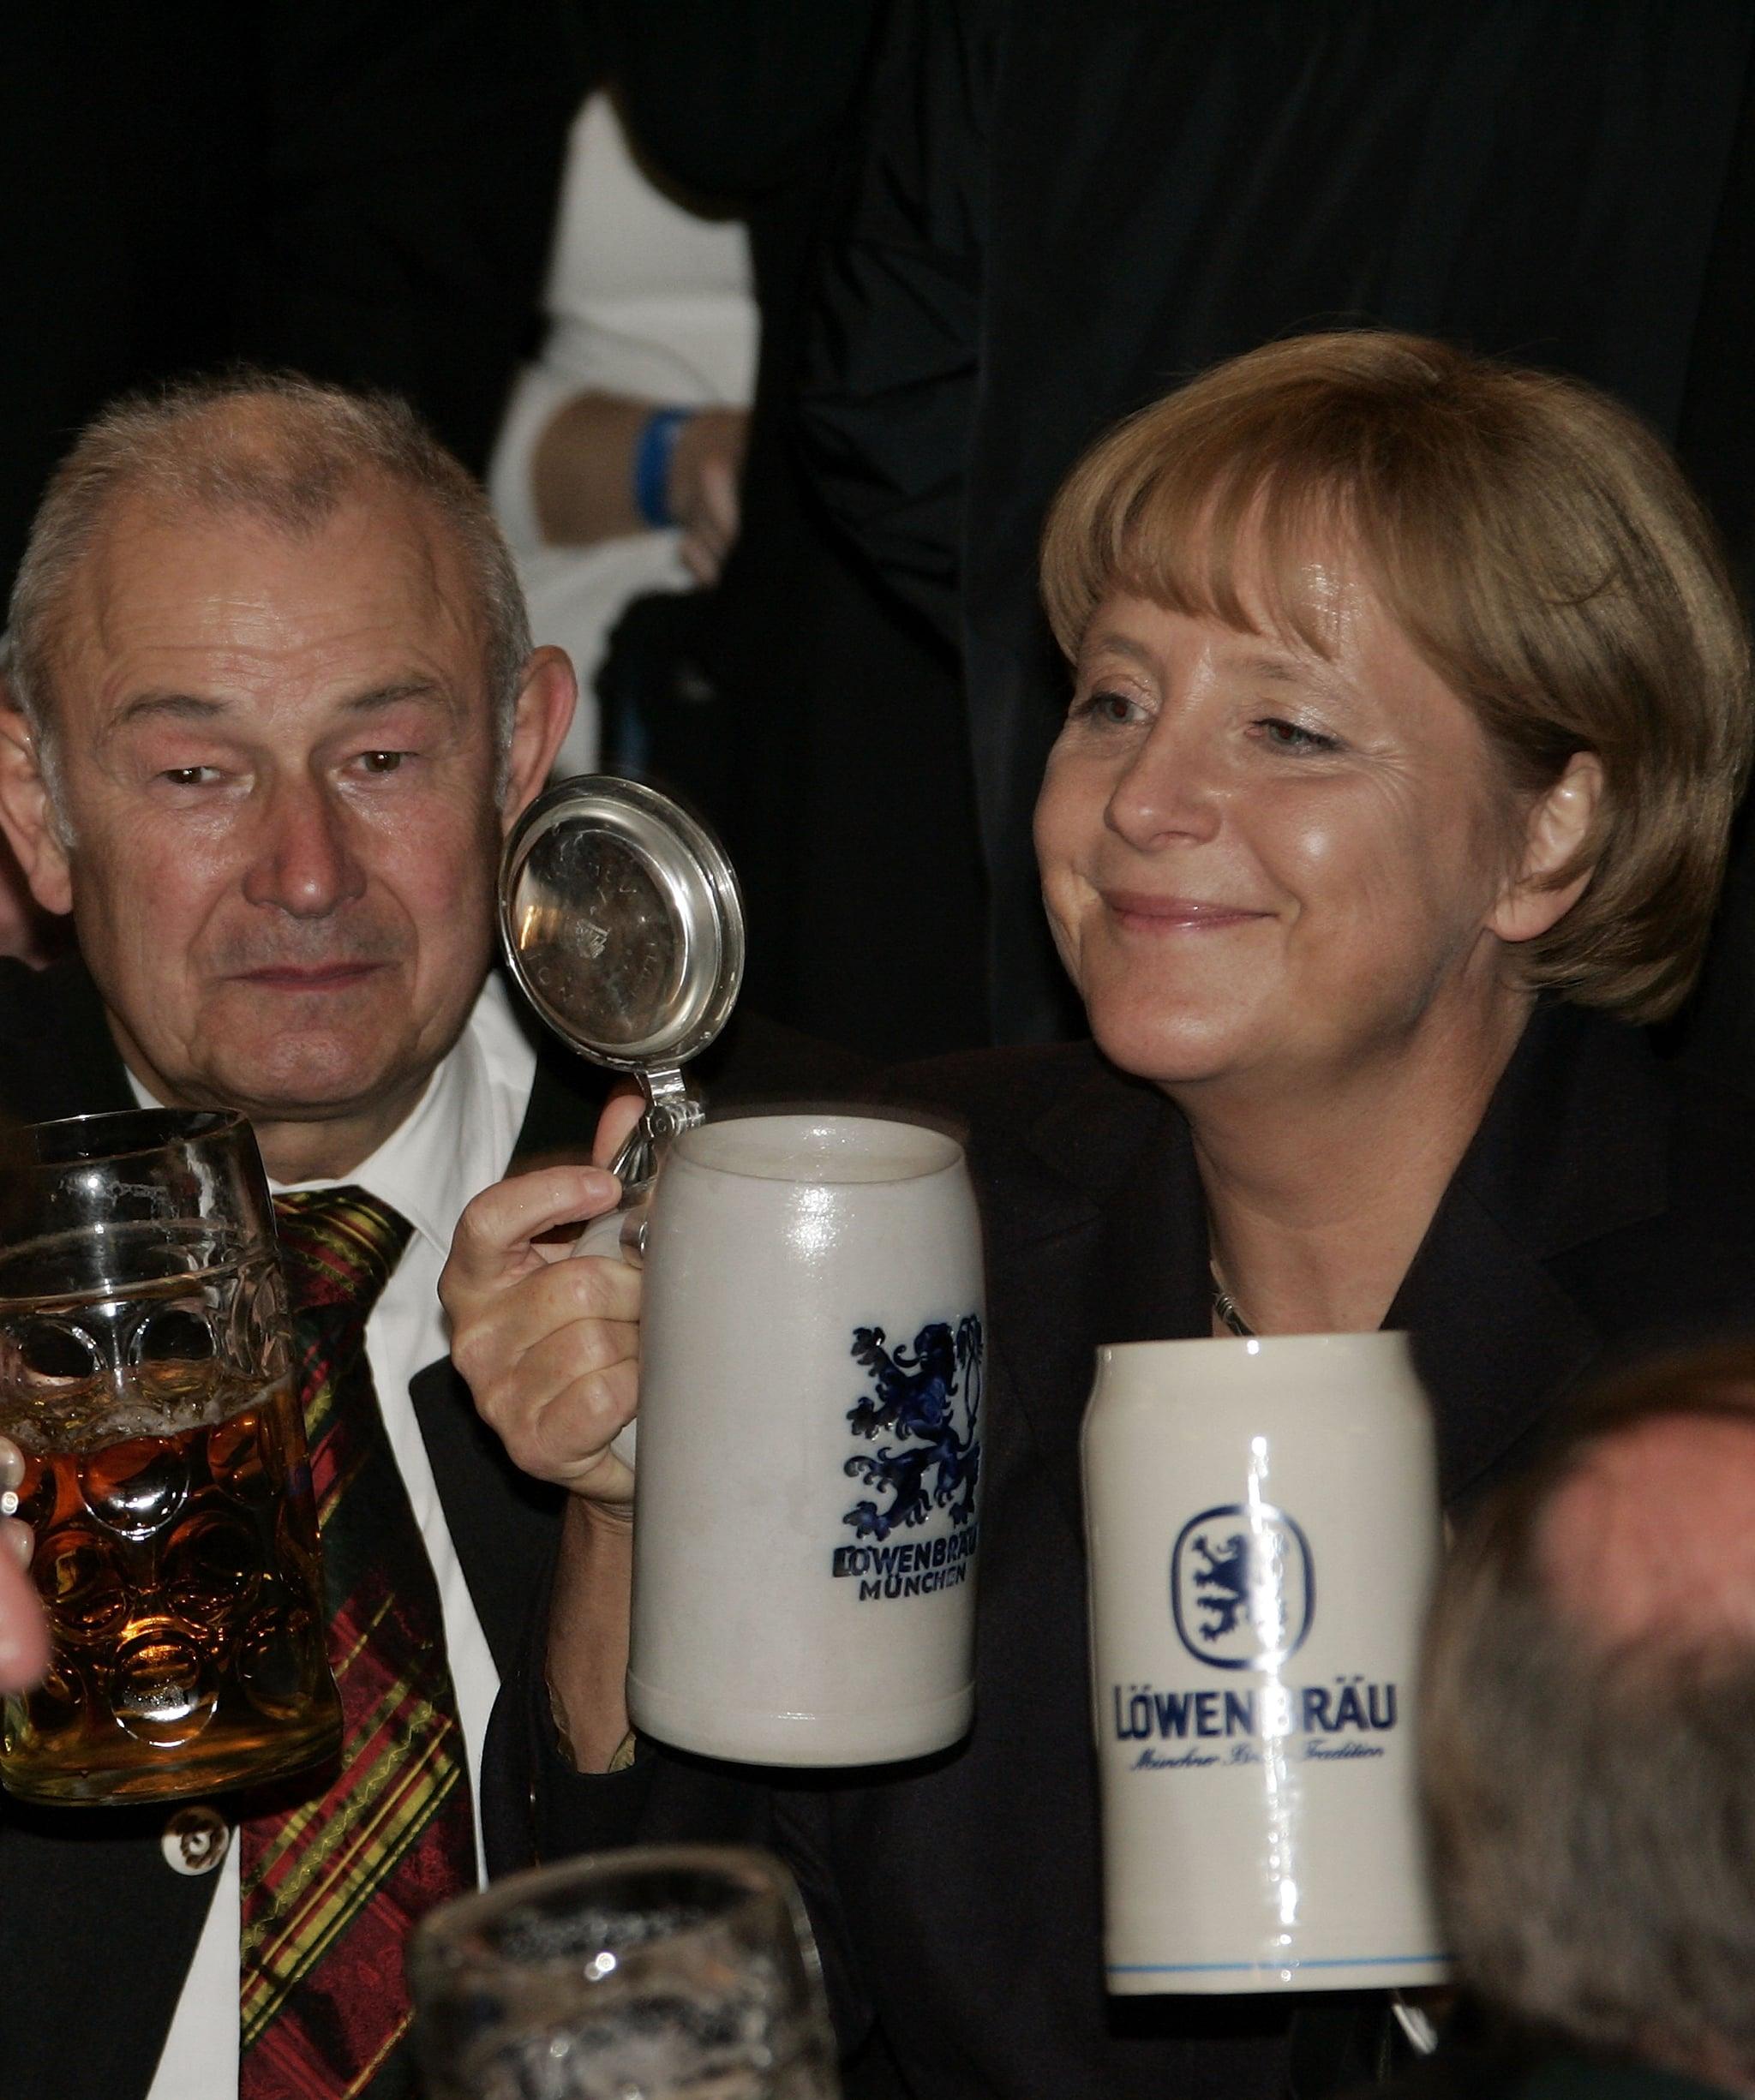 Bavaria's state governor Guenther Beckstein and German Chancellor Angela Merkel